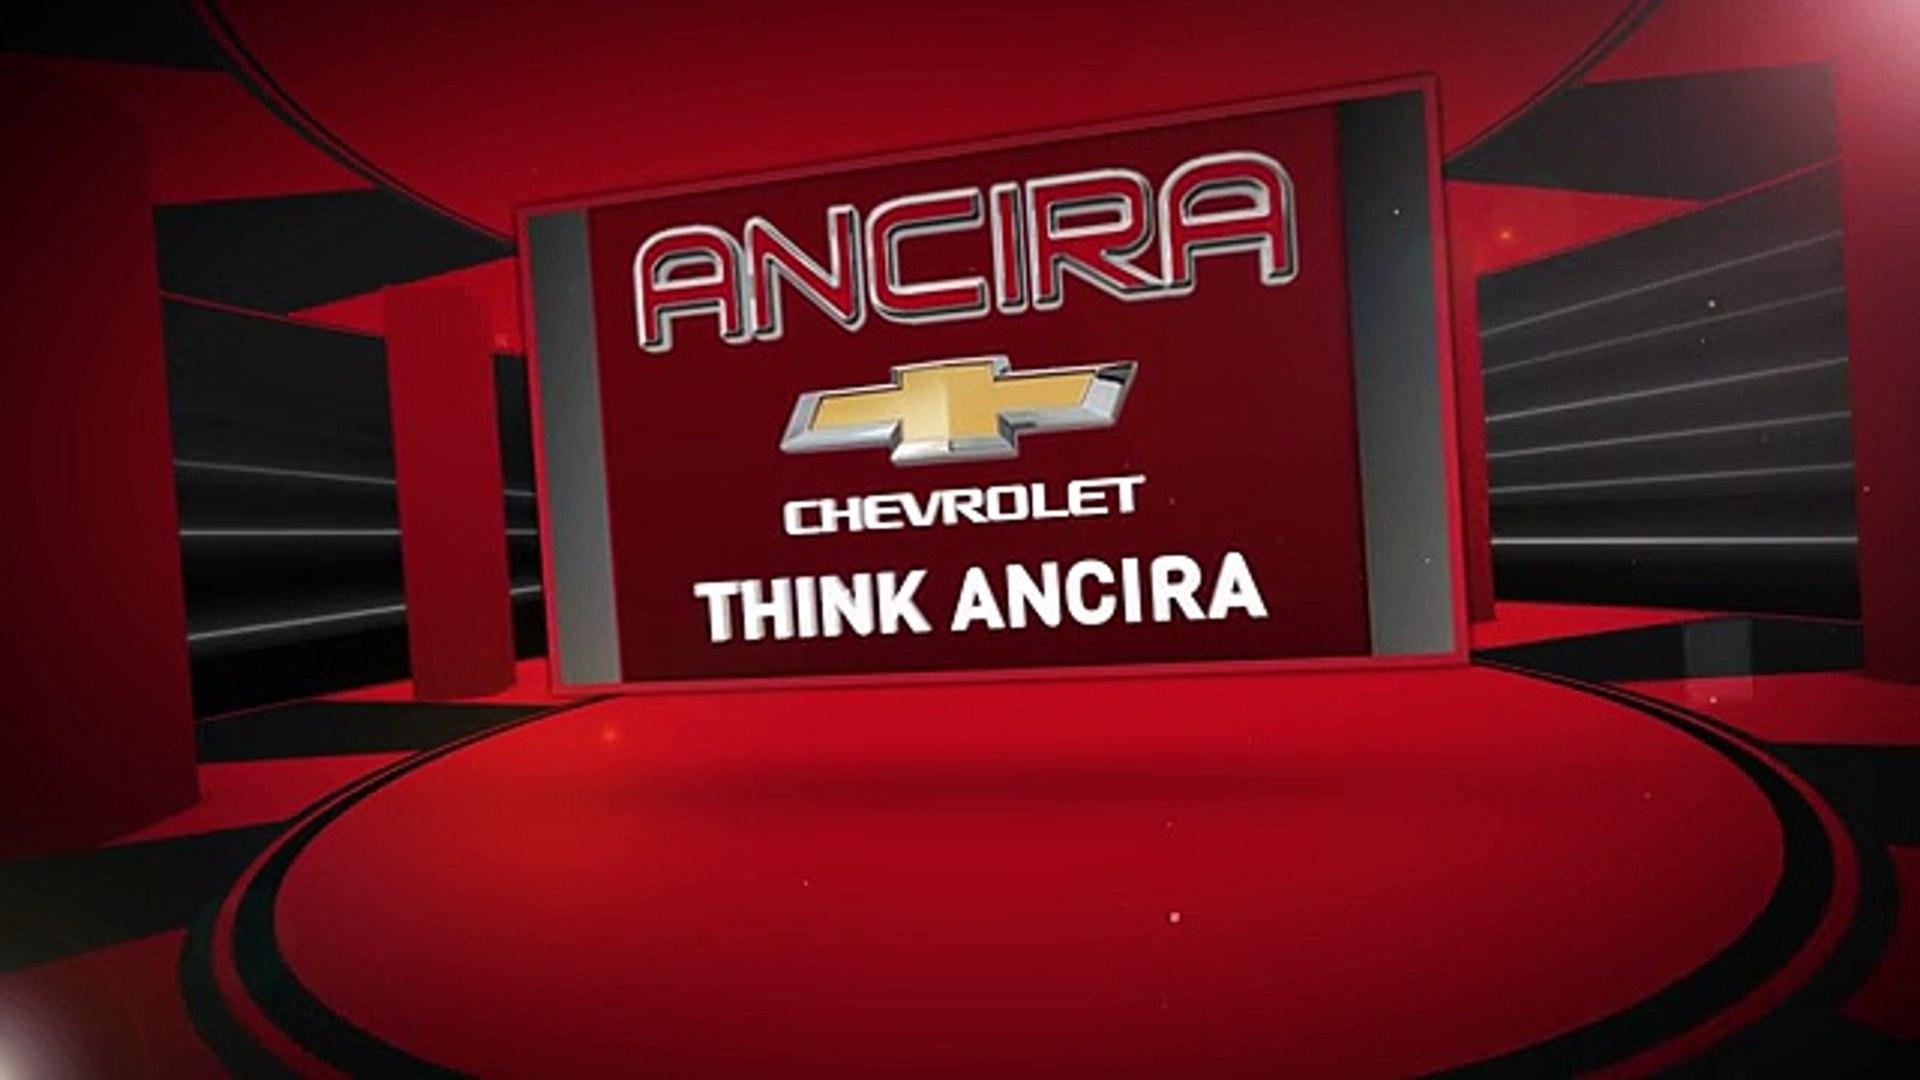 Used Chevy Impala LT San Antonio TX   LOWEST PRICE Chevrolet Impala Dealer San Antonio TX